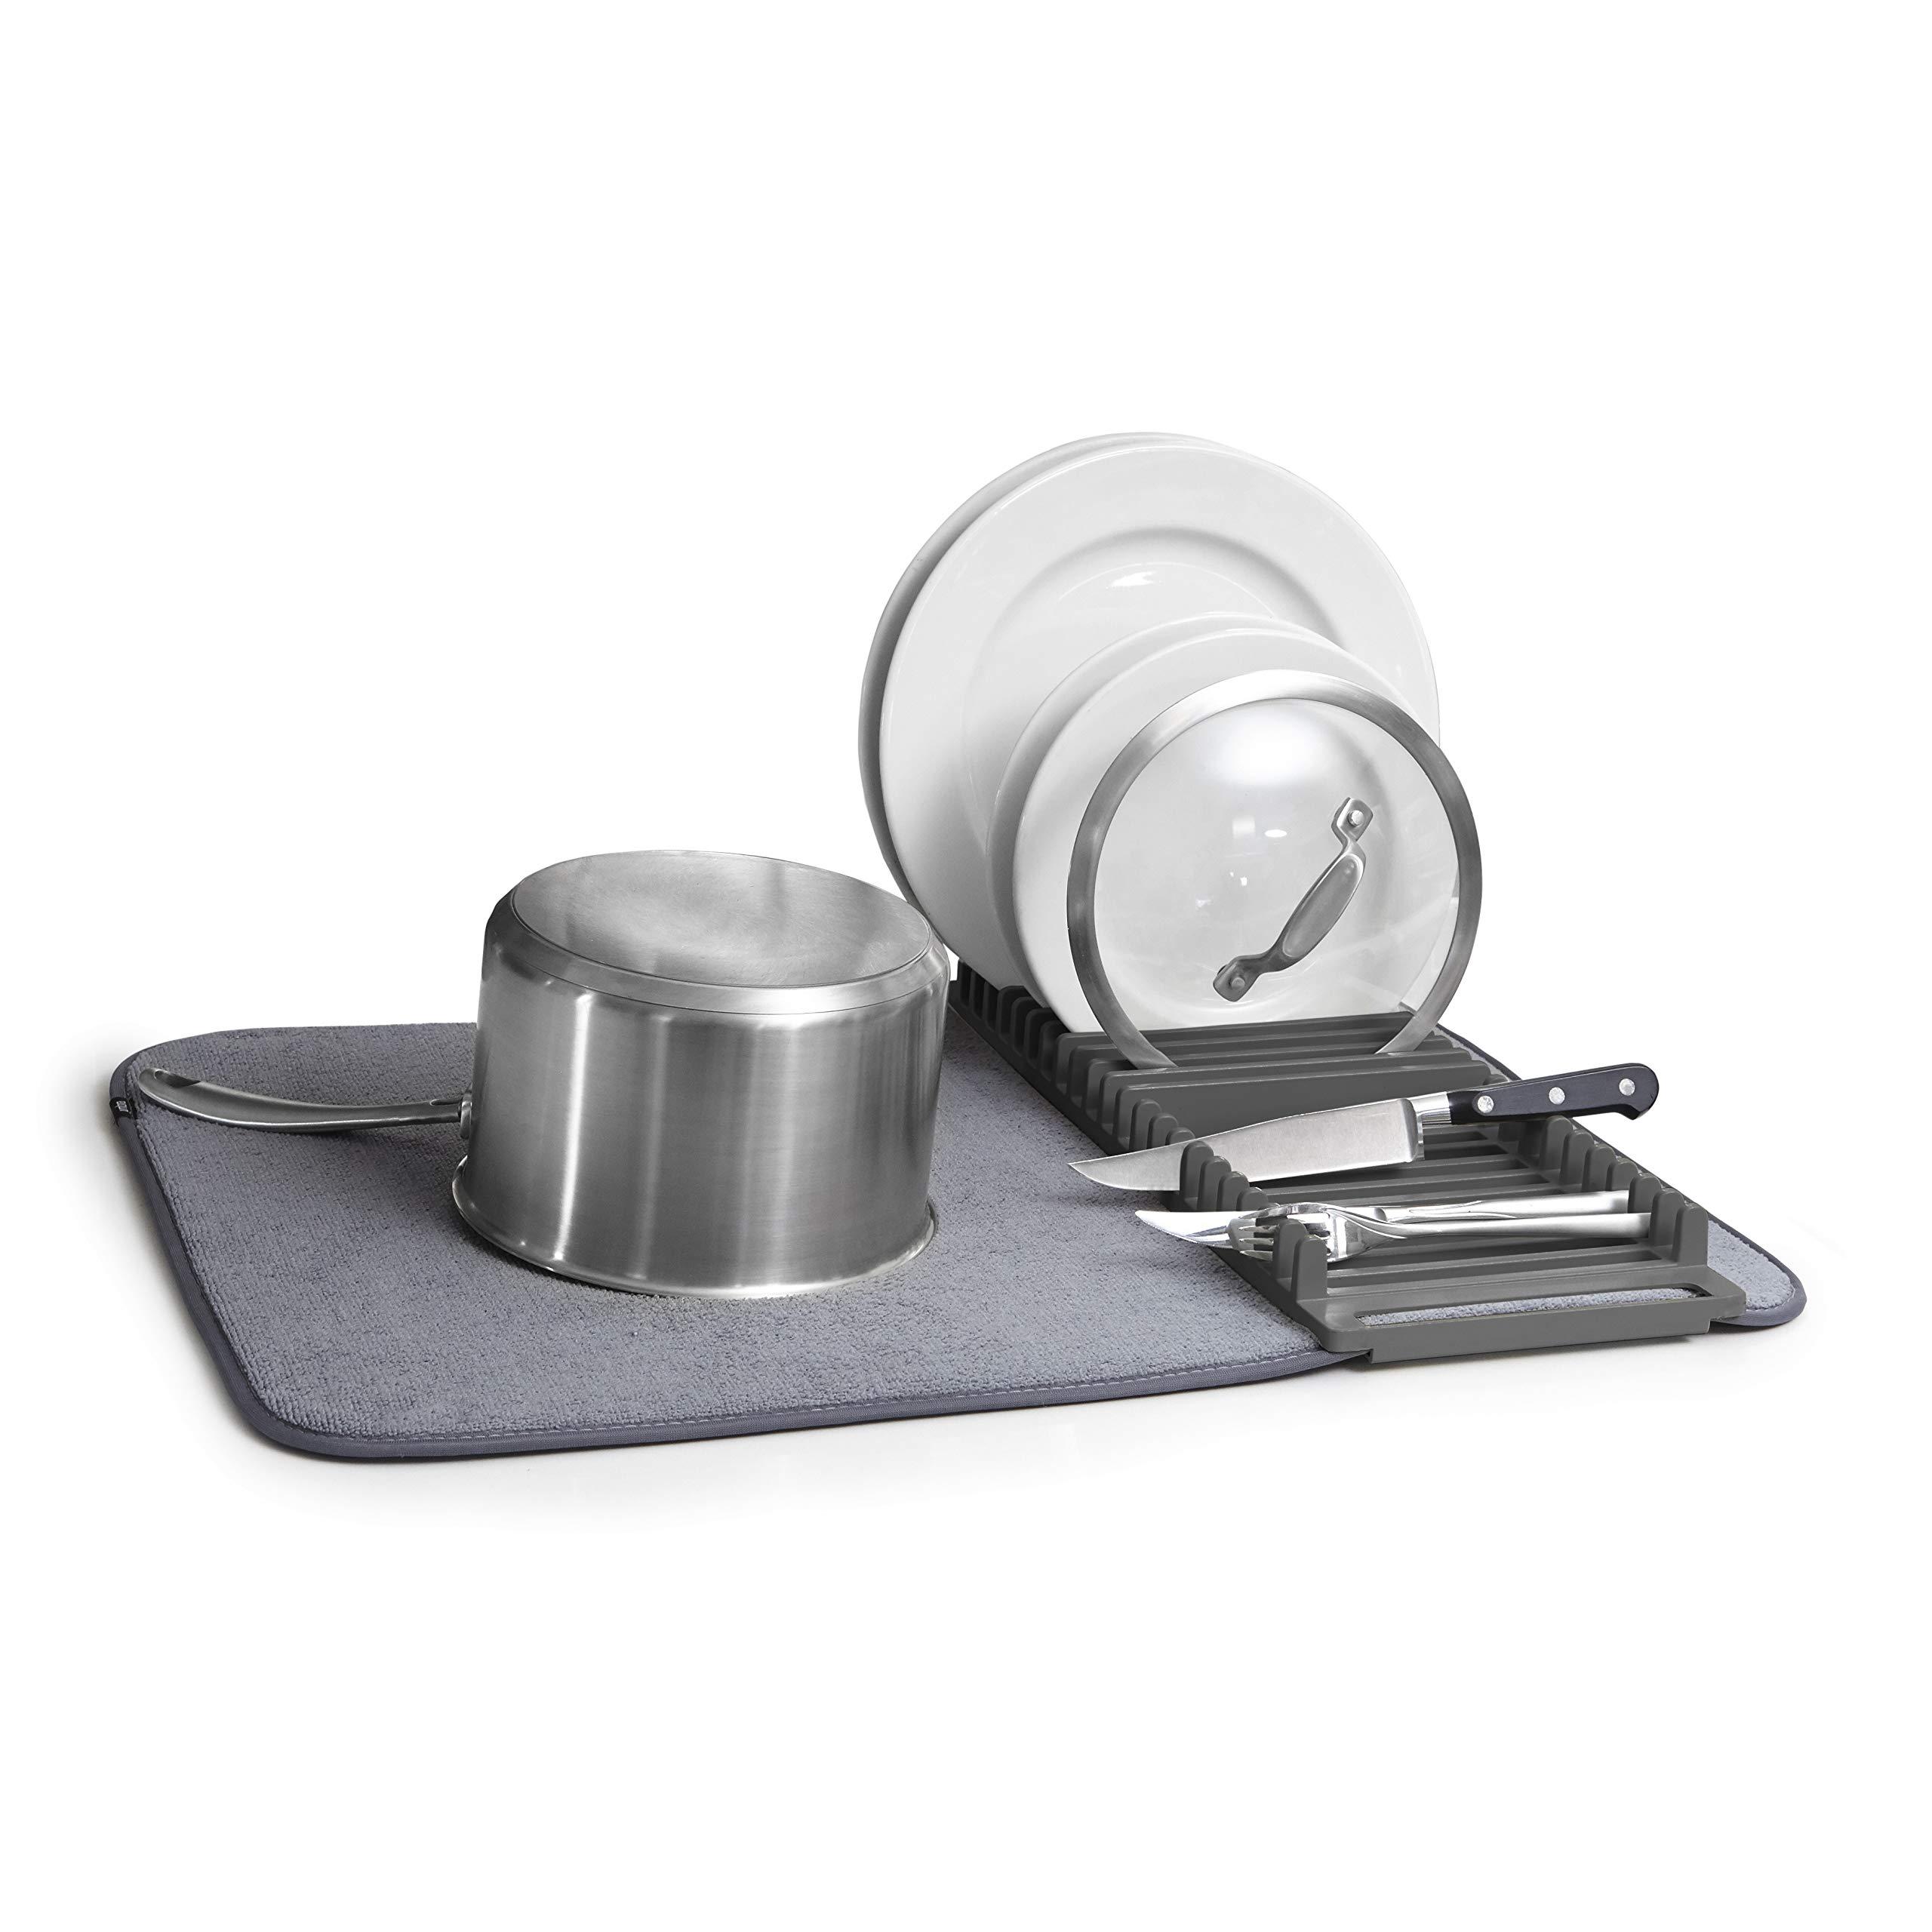 Umbra 330720 149 Drying Microfiber Charcoal